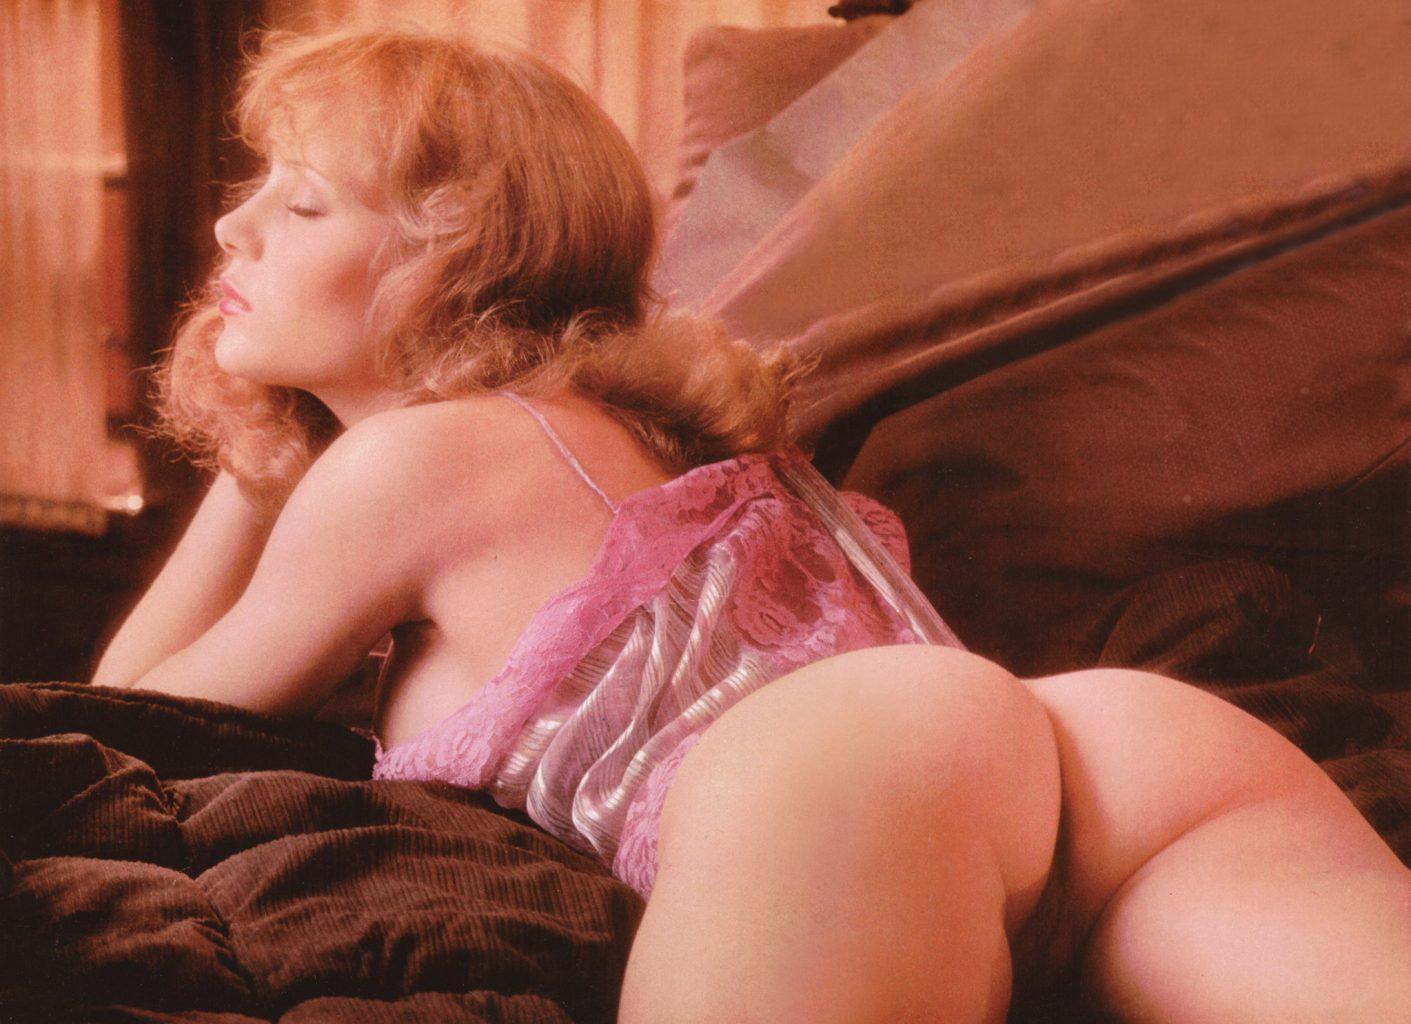 Kimberly McArthur January 1982 Playboy Playmate